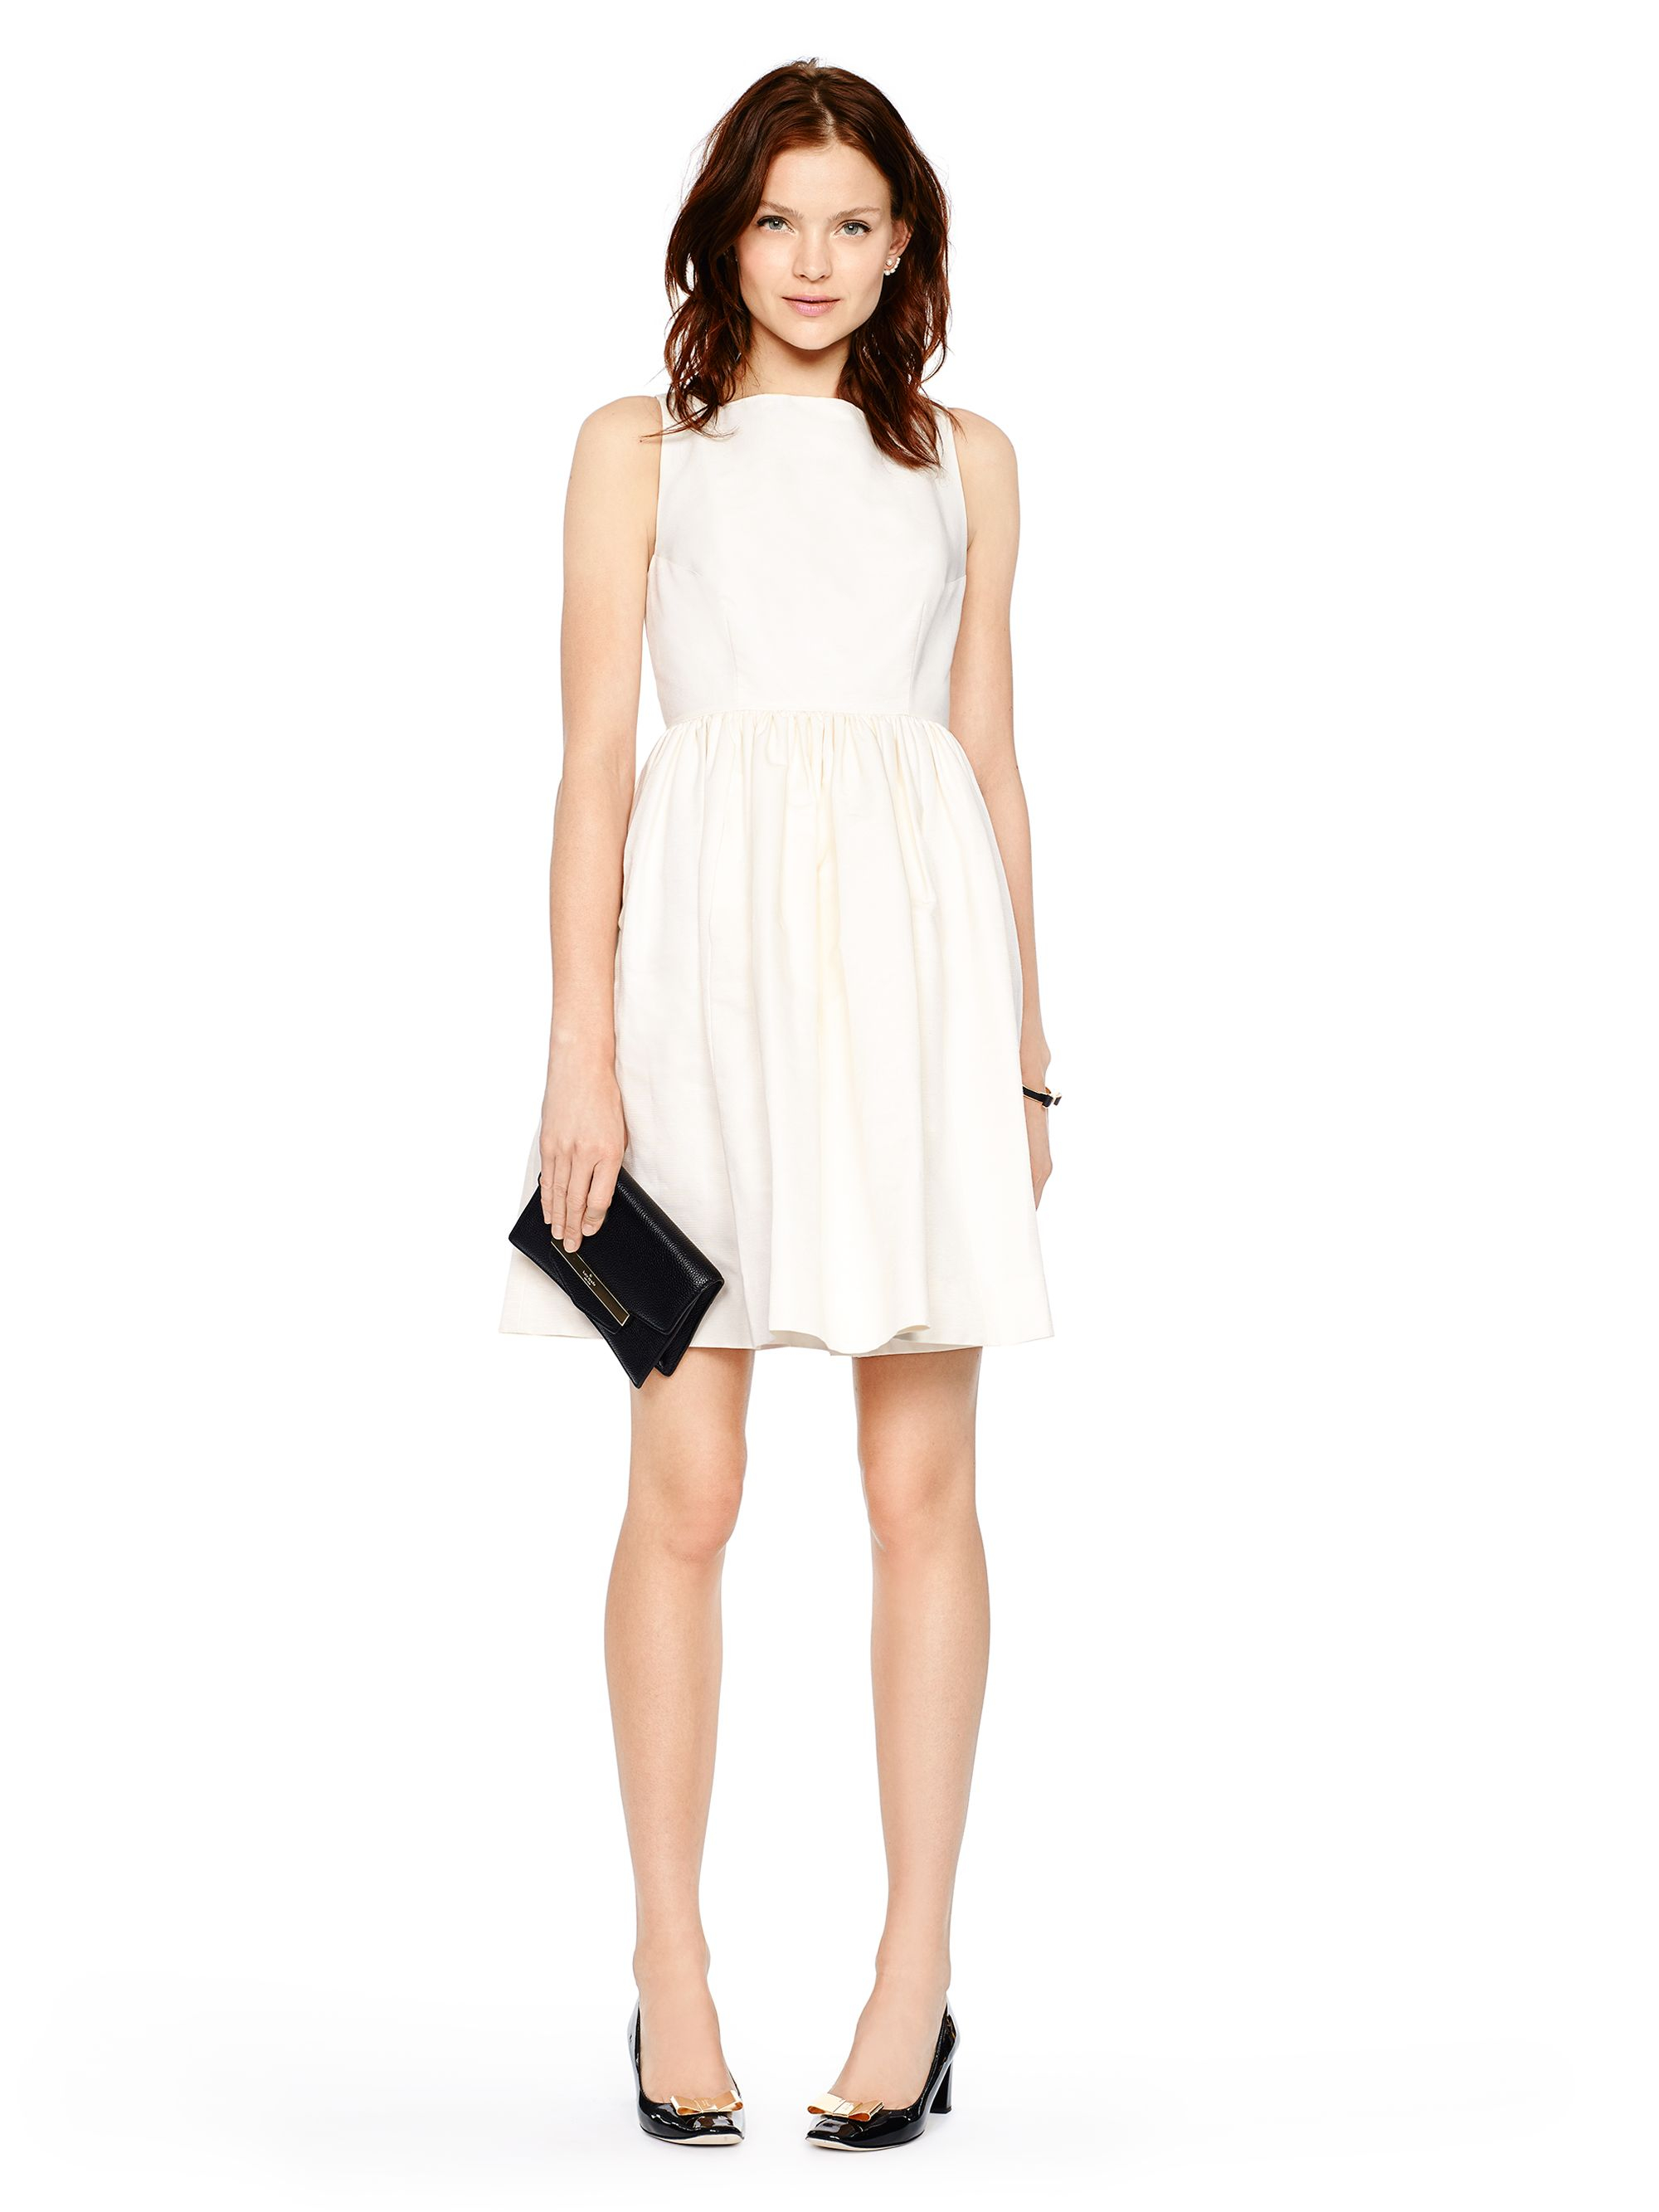 Lyst Kate Spade New York Tanner Dress In White